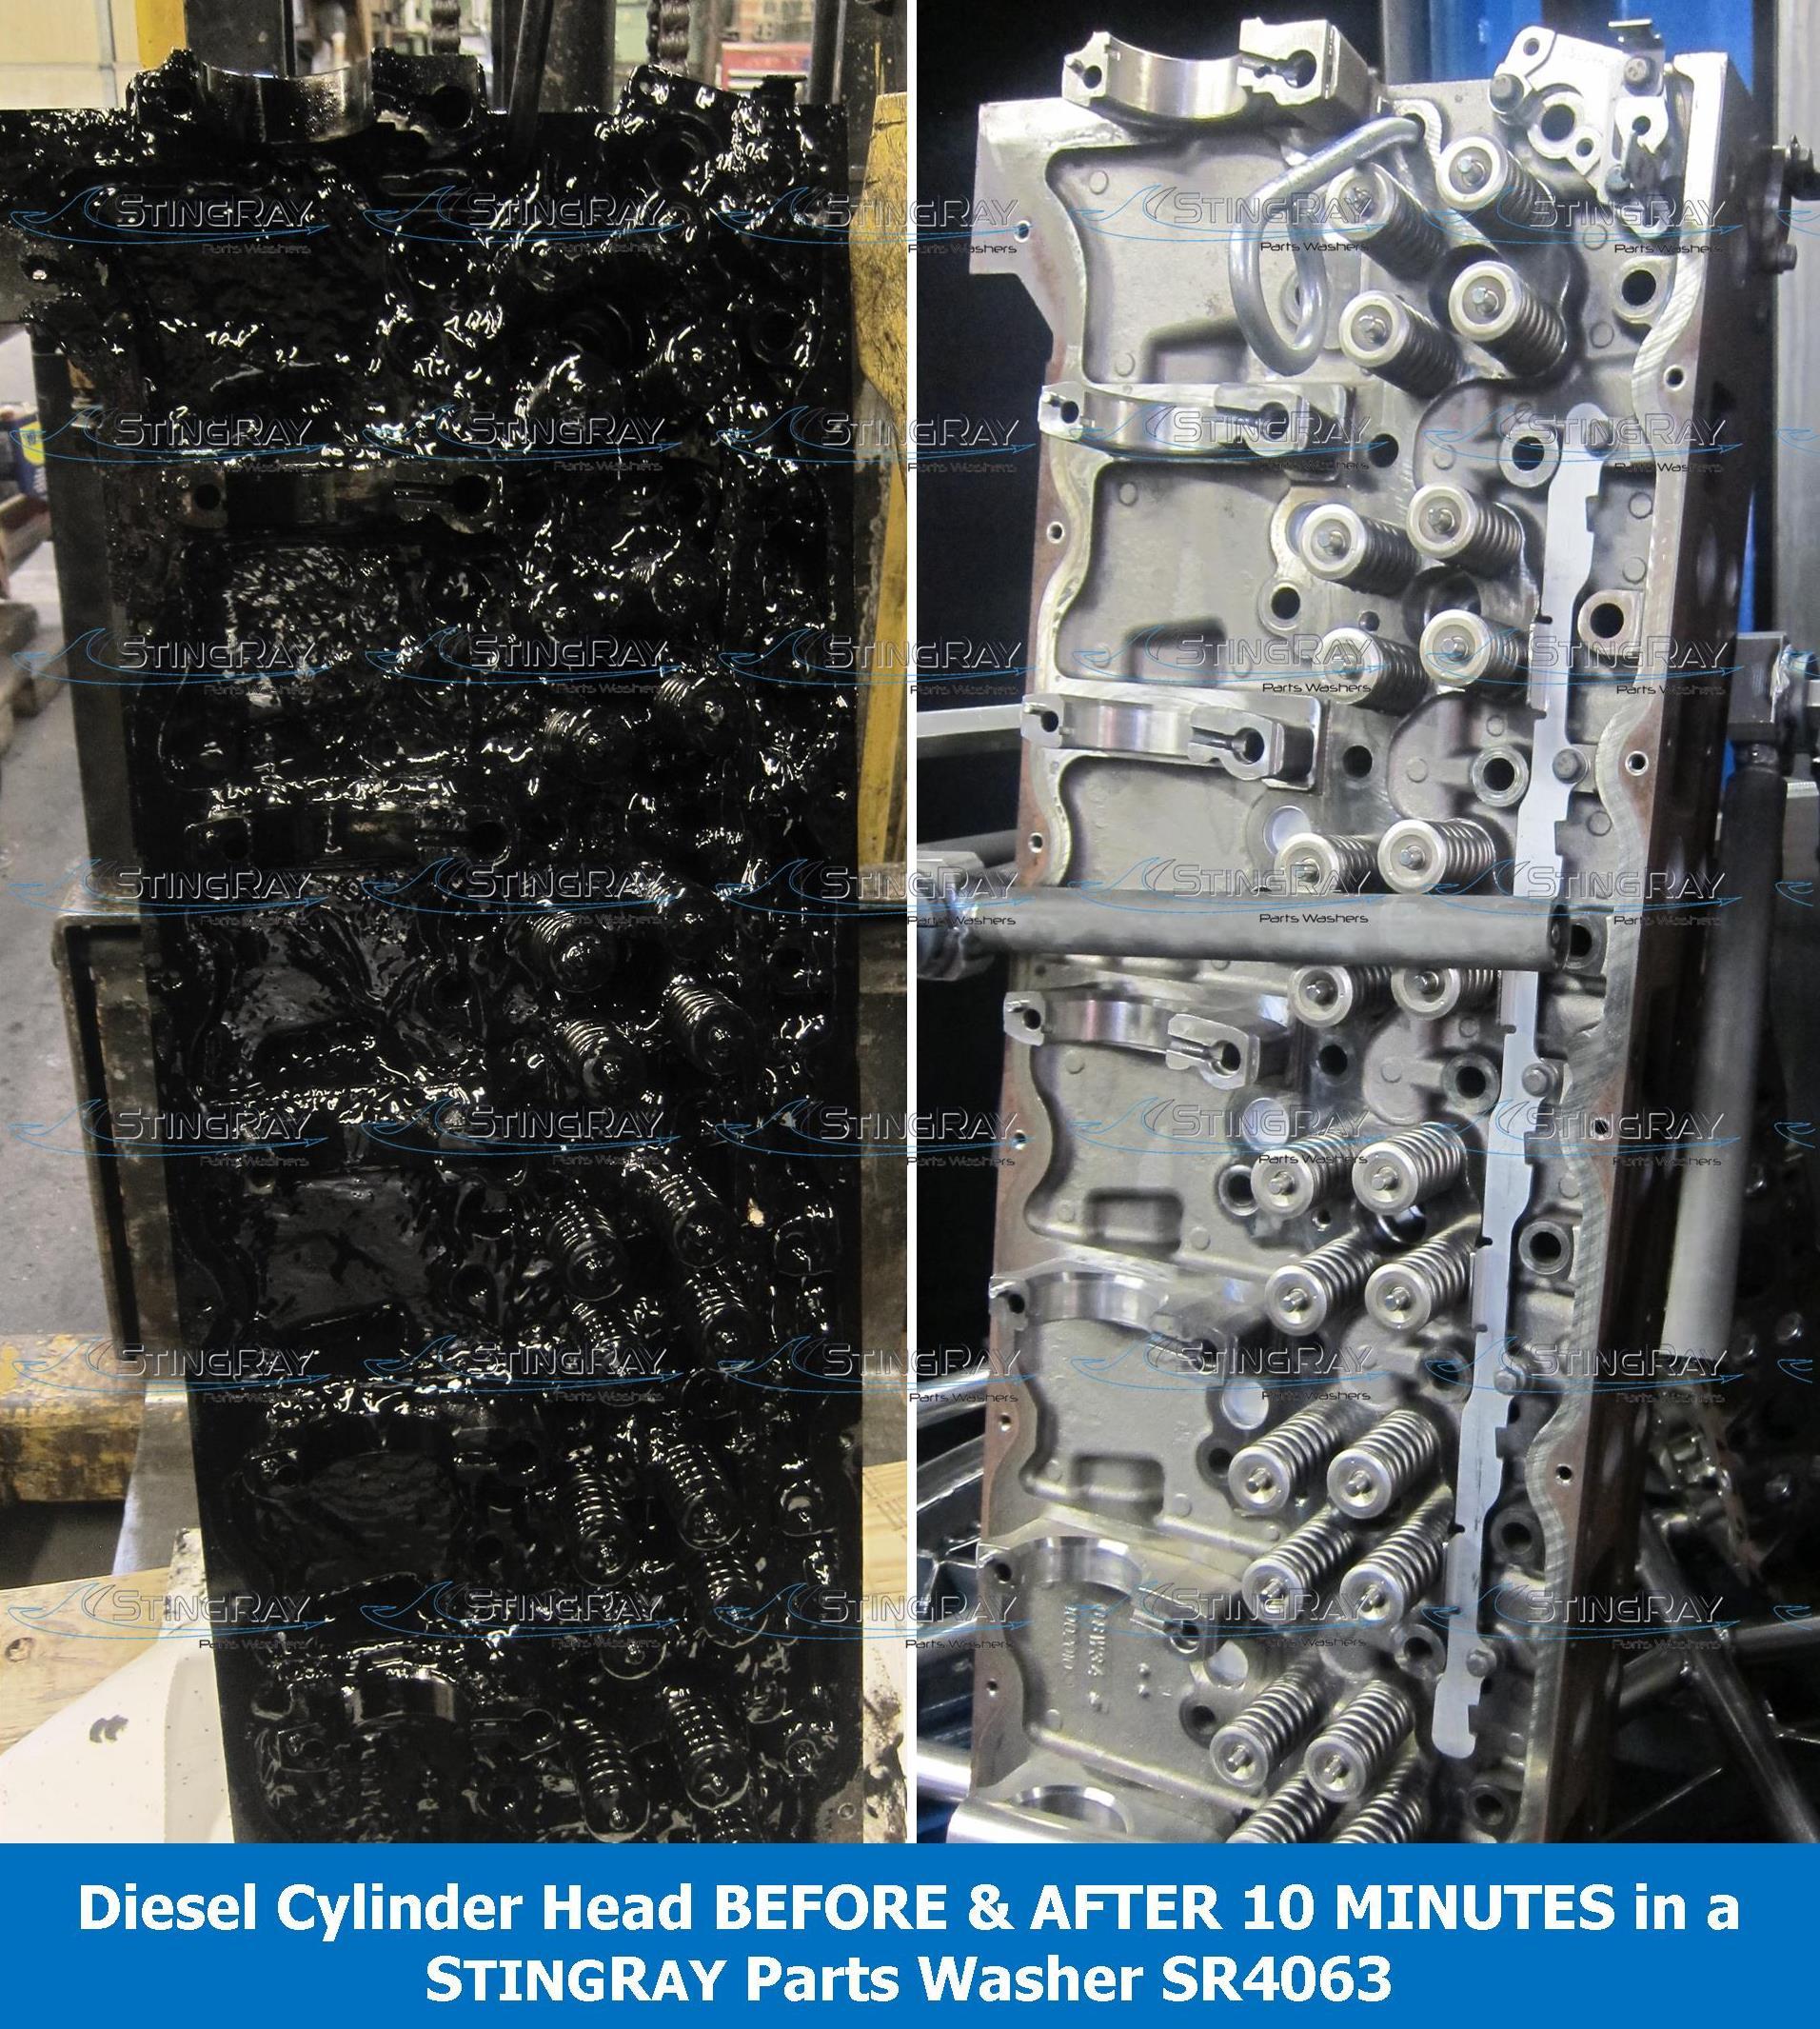 Stingray Parts Washer Aqueous Transmission Parts Washer